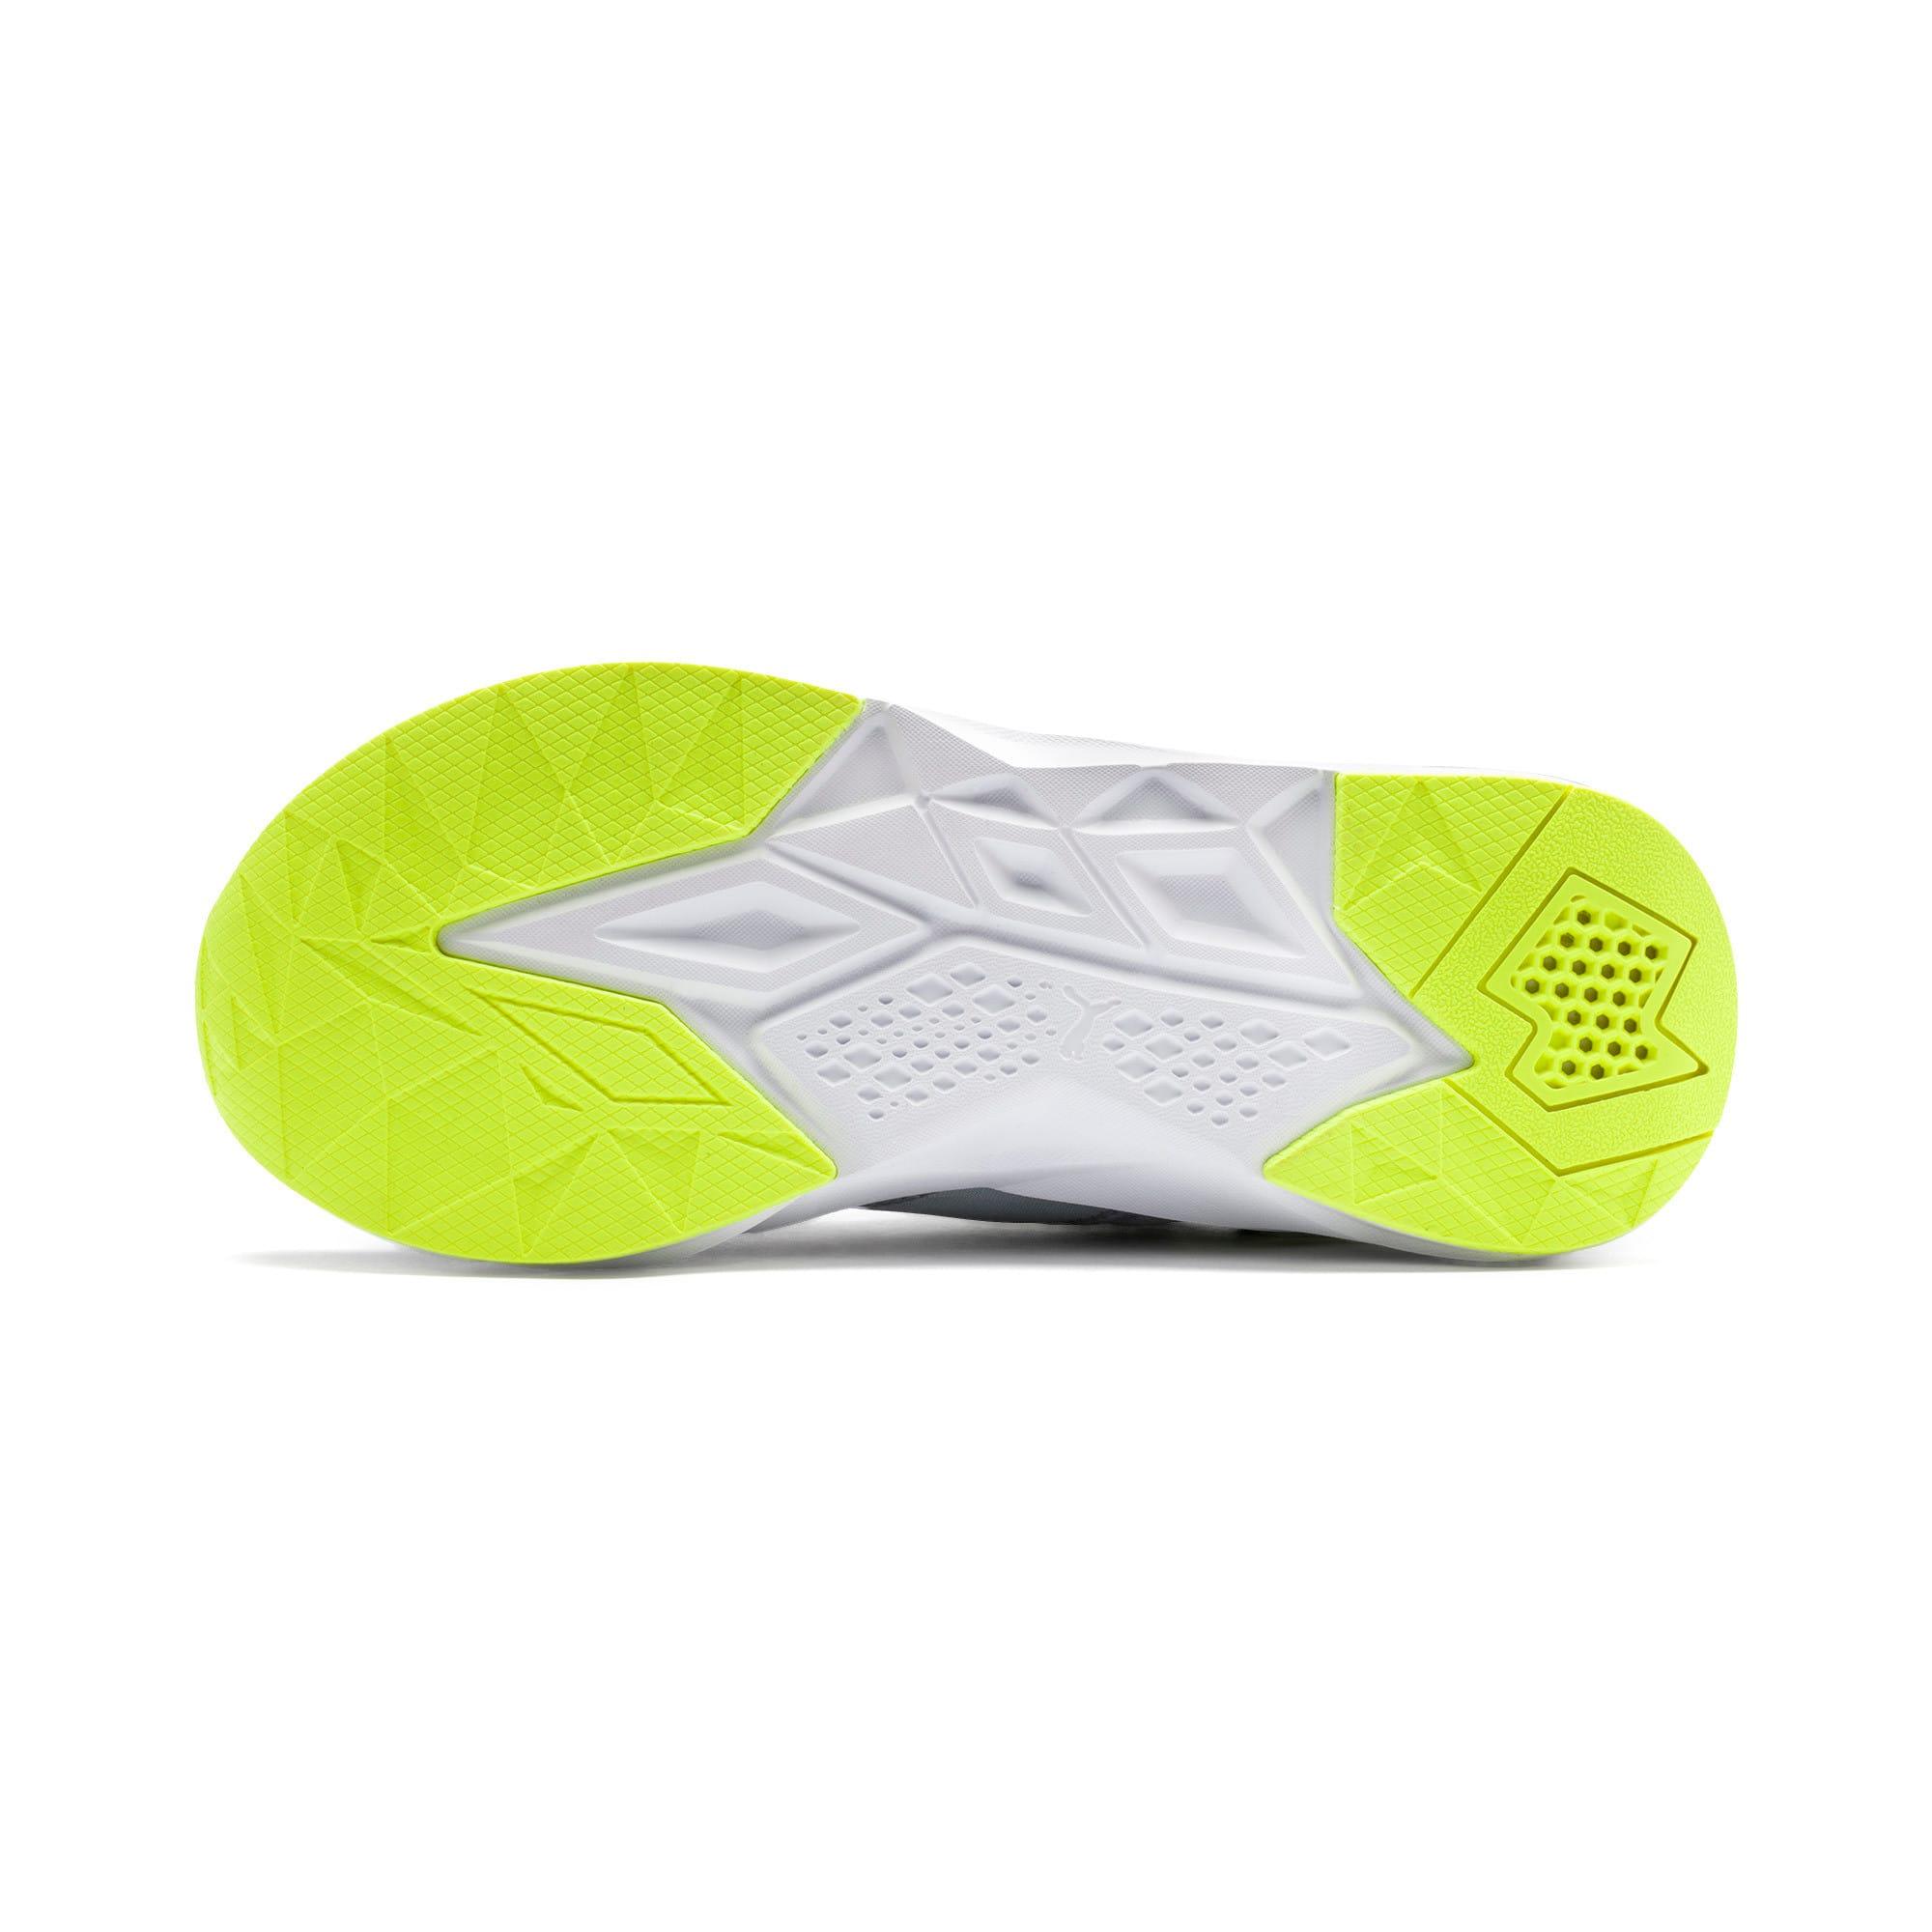 Thumbnail 5 of CELL Plasmic Damen Sneaker, Quarry-Puma White, medium